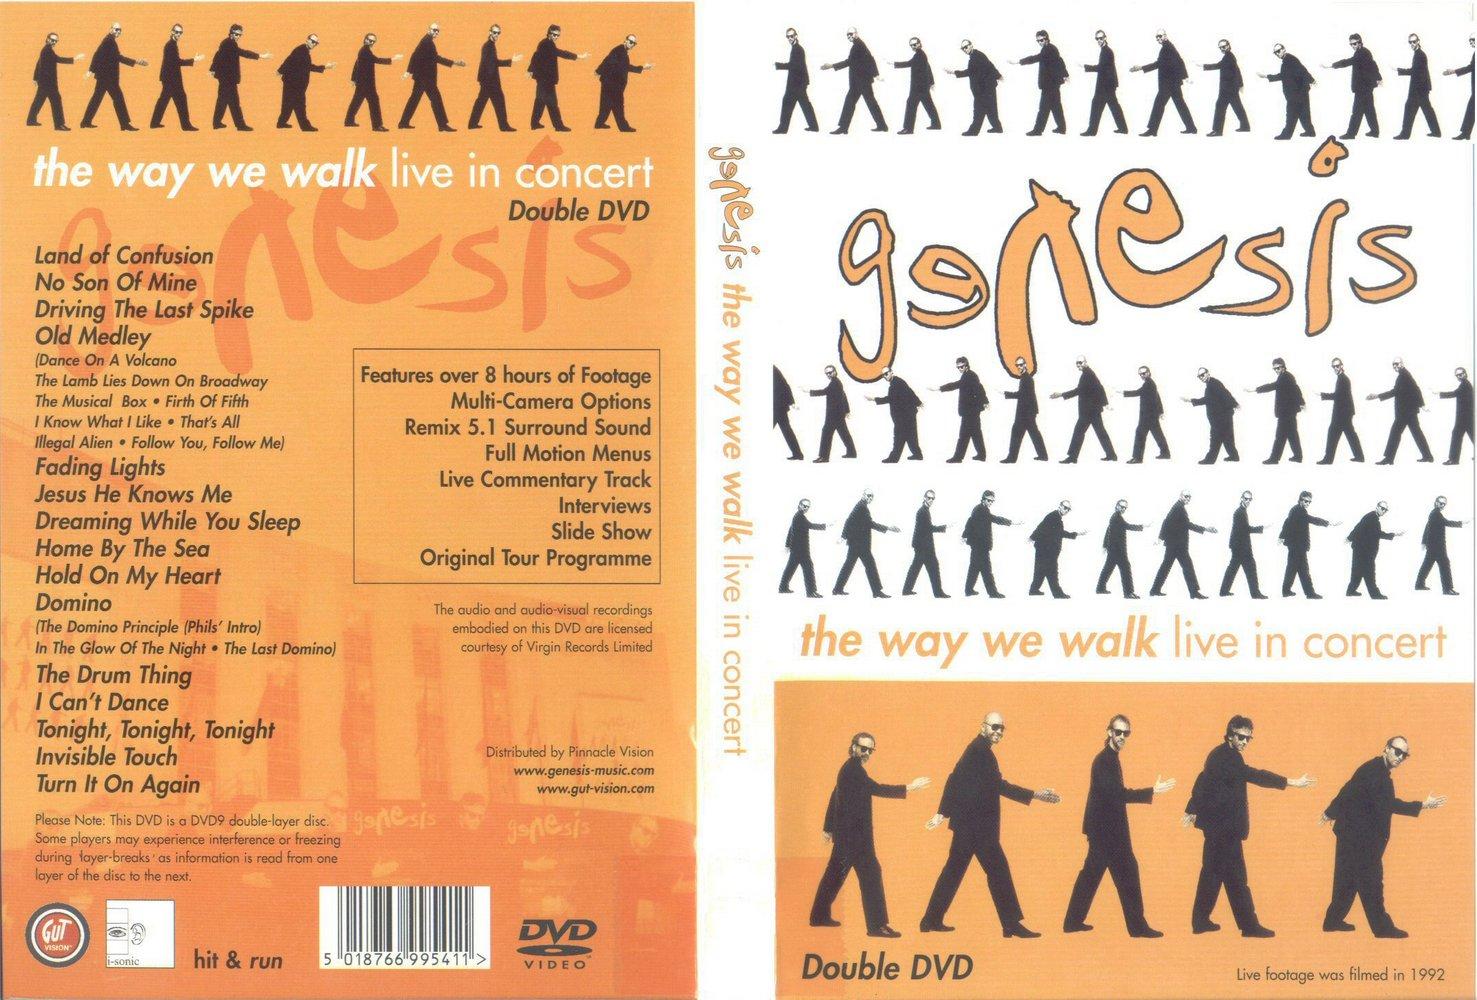 http://4.bp.blogspot.com/-DhR7GW3SC6M/TVZtM9YebdI/AAAAAAAABck/OtHdxOaQWXk/s1600/Genesis+-+The+Way+We+Walk+Concert+capa.jpg